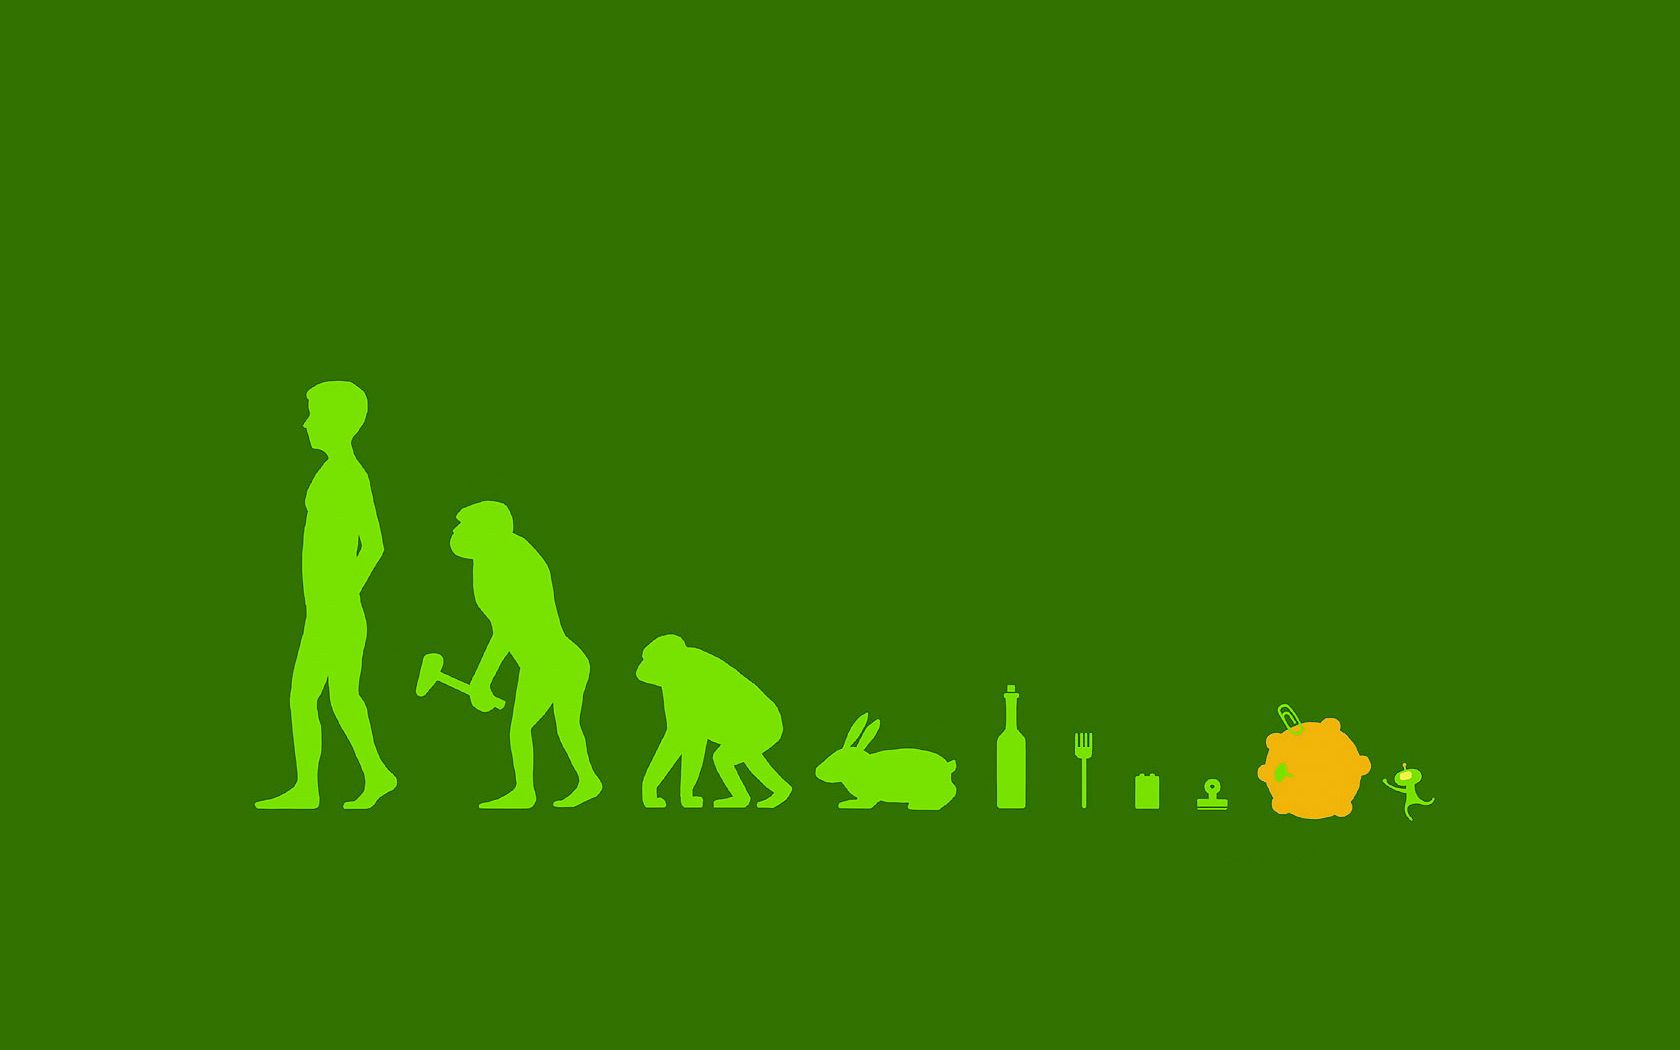 Download Katamari Evolution Wallpaper 1680x1050 1680x1050